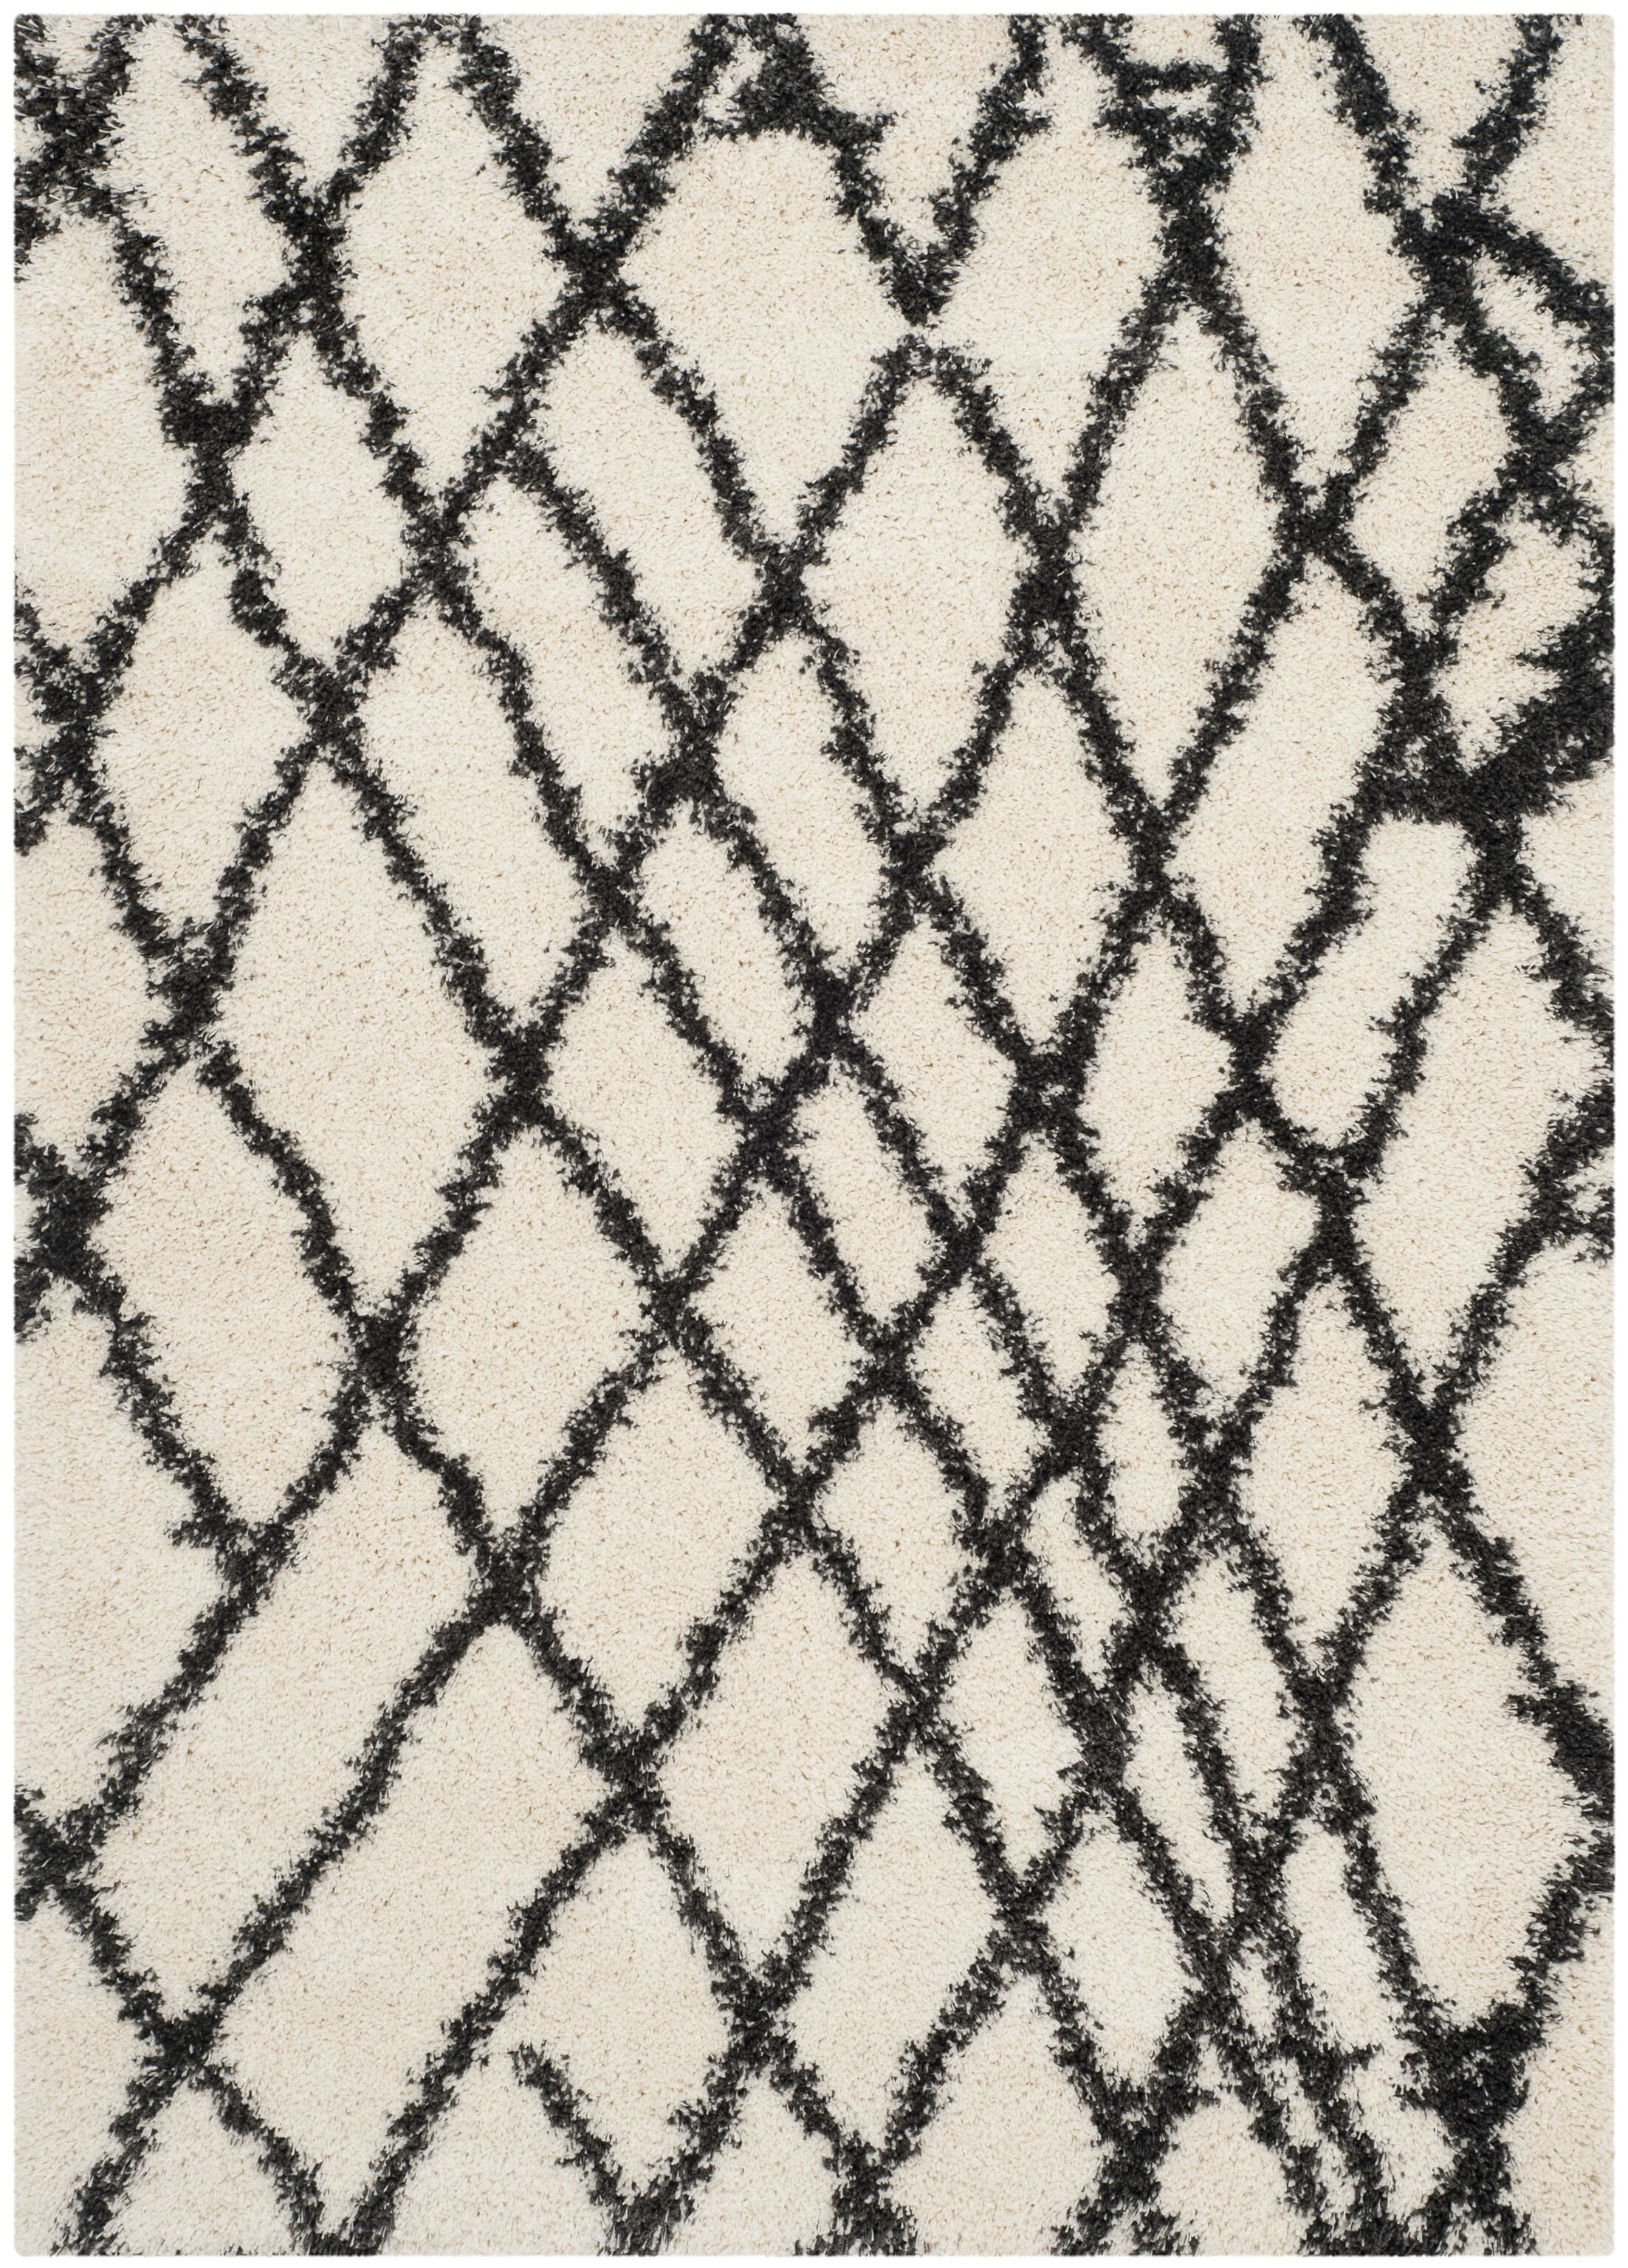 Malibu Ivory/Charcoal Area Rug Rug Size: Rectangle 5'1